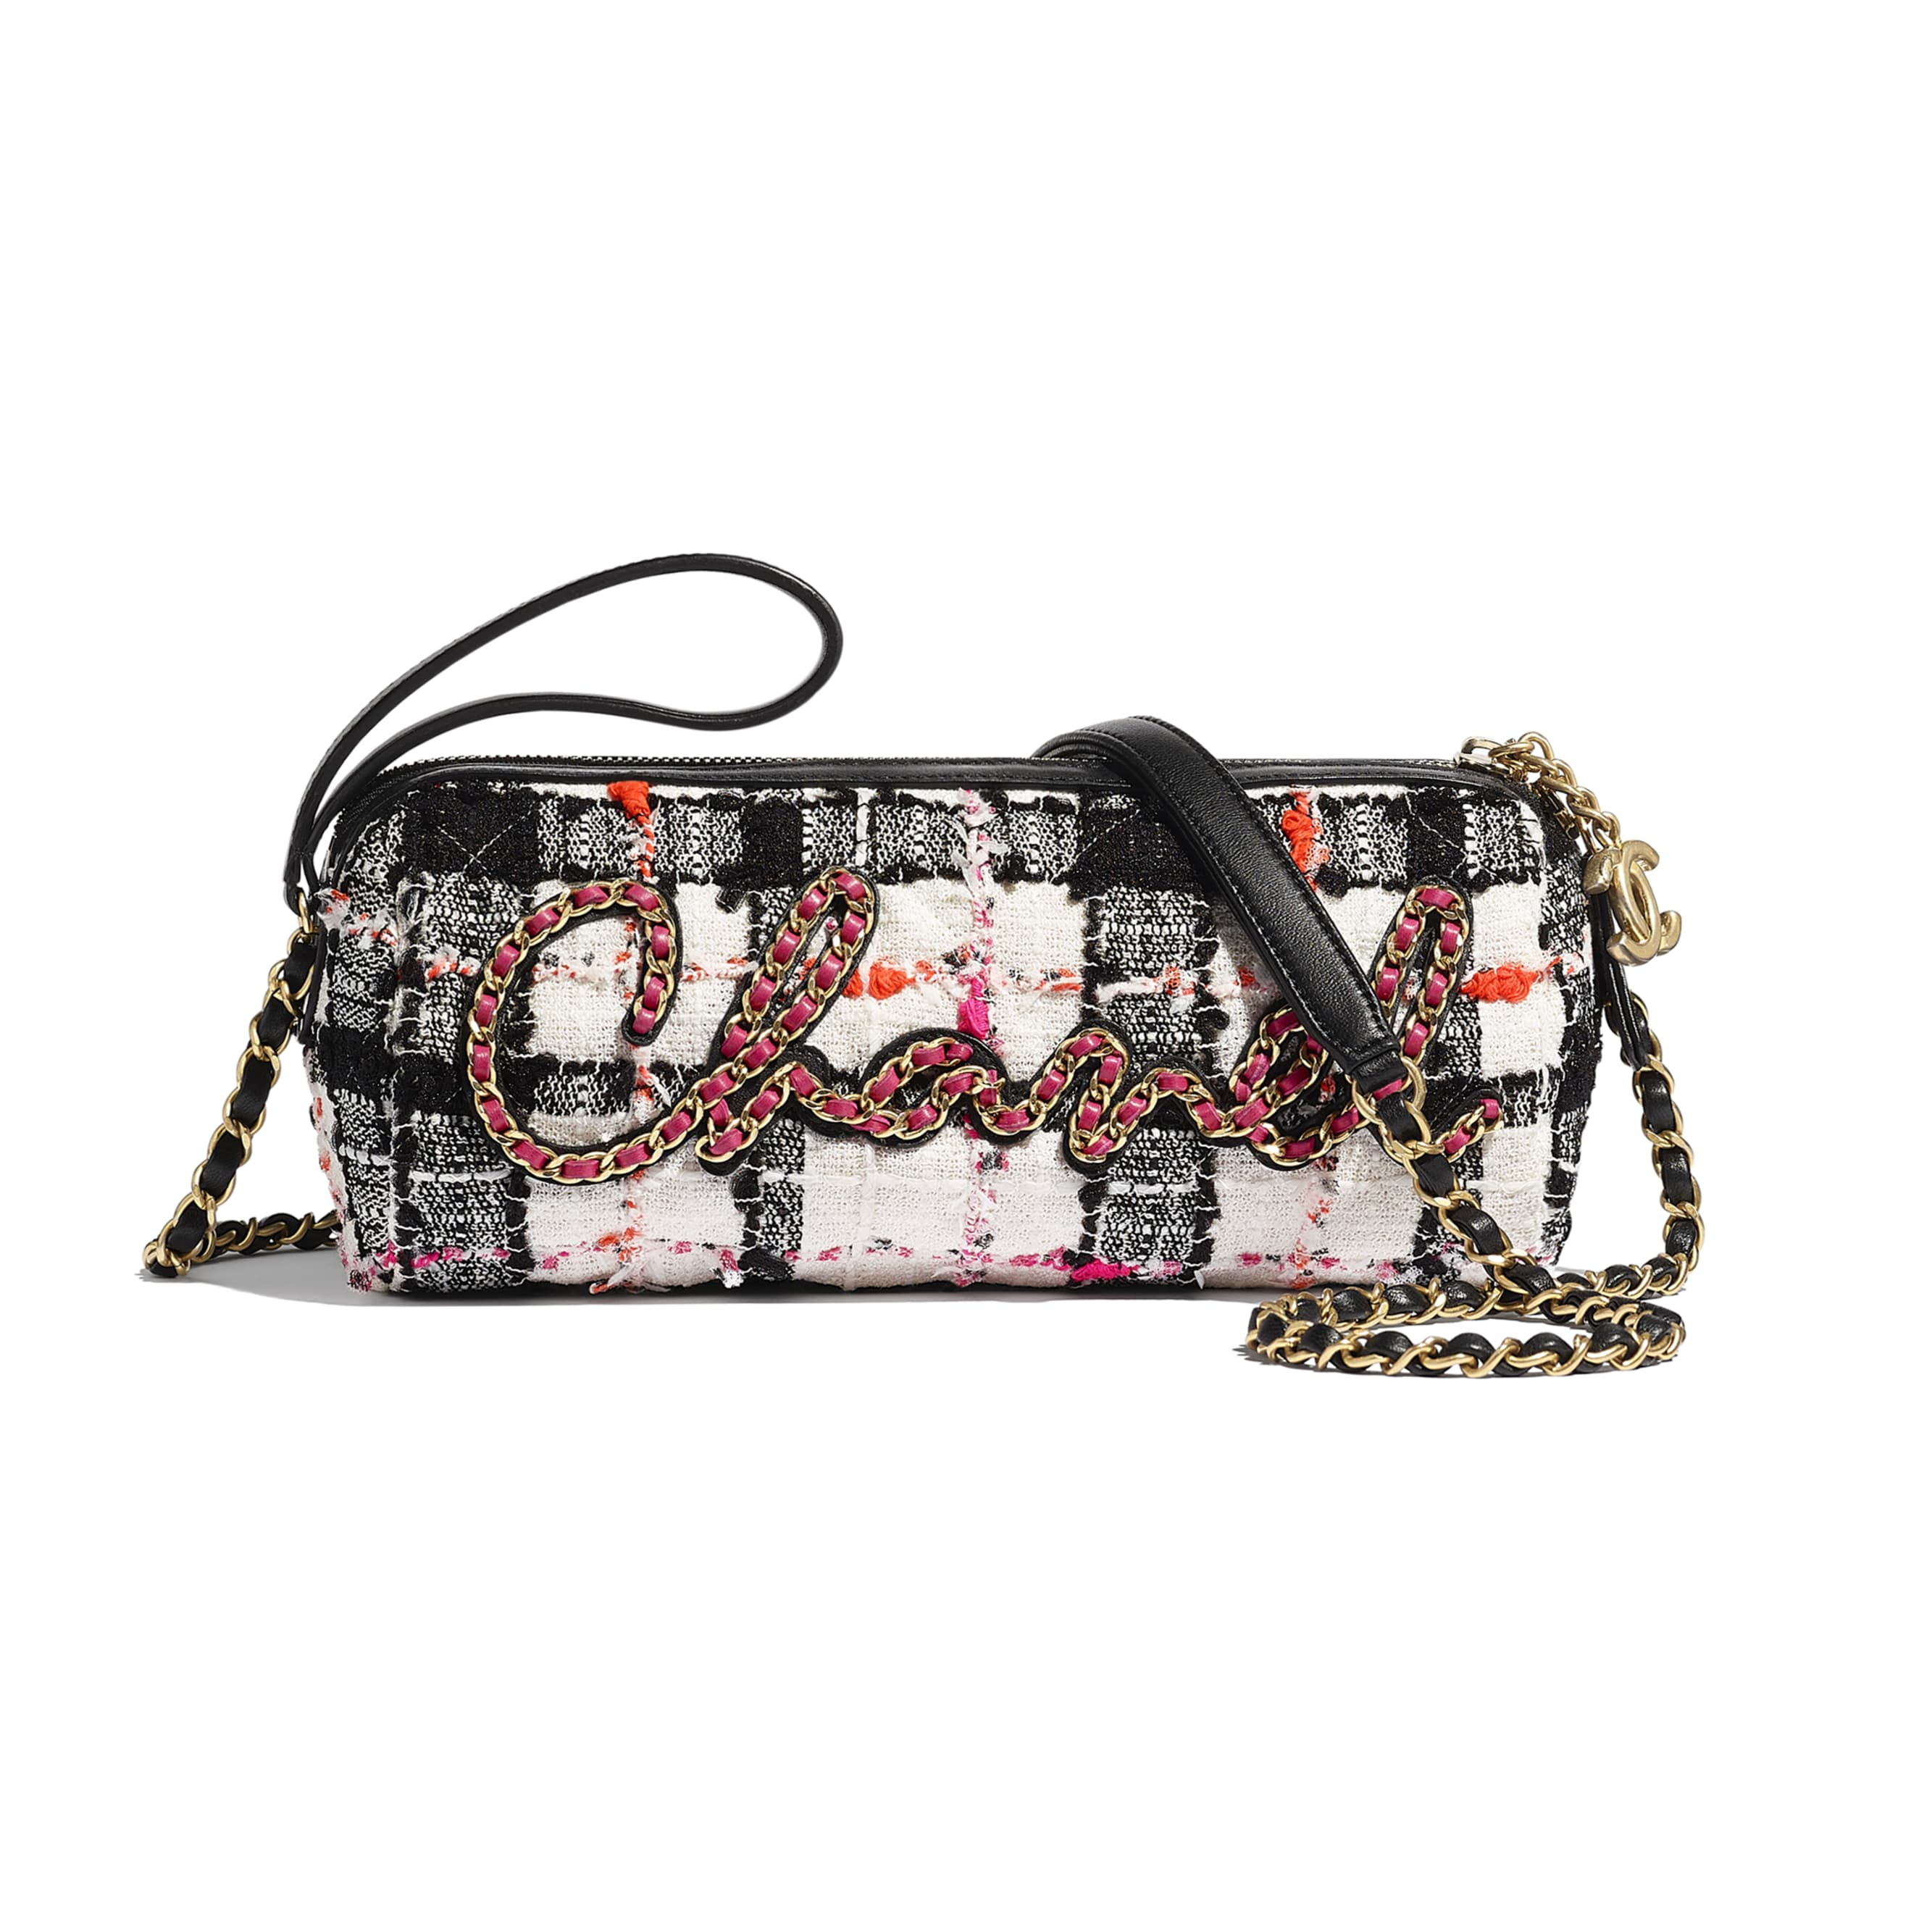 Bolsa Bowling - White, Black, Pink & Orange - Tweed, Calfskin & Gold-Tone Metal - CHANEL - Vista predefinida - ver a versão em tamanho standard